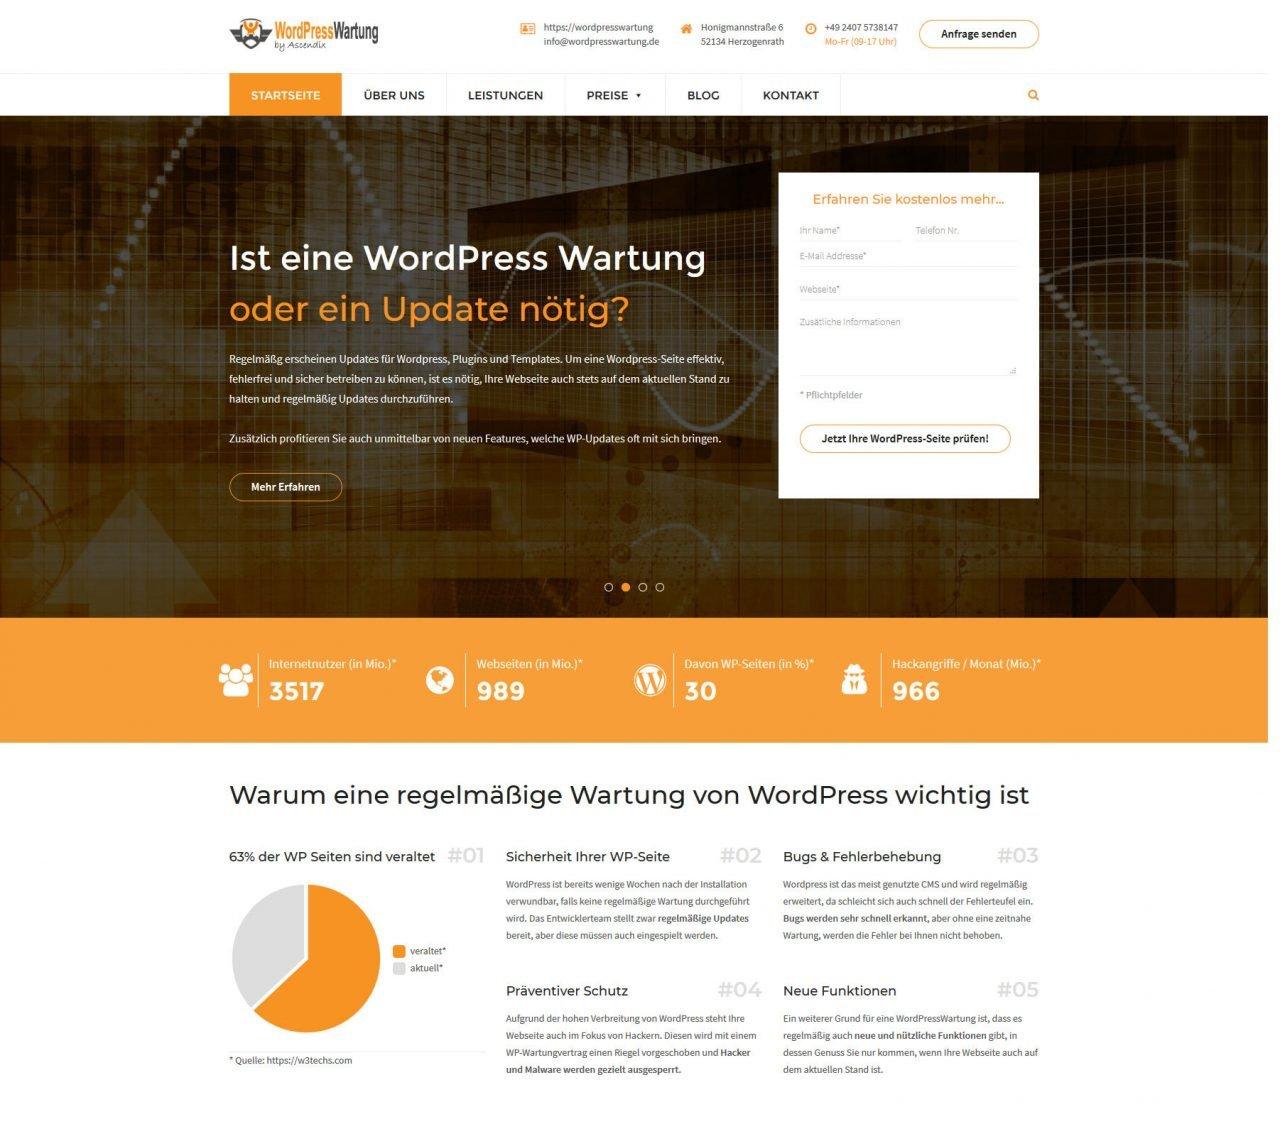 WordPressWartung.de